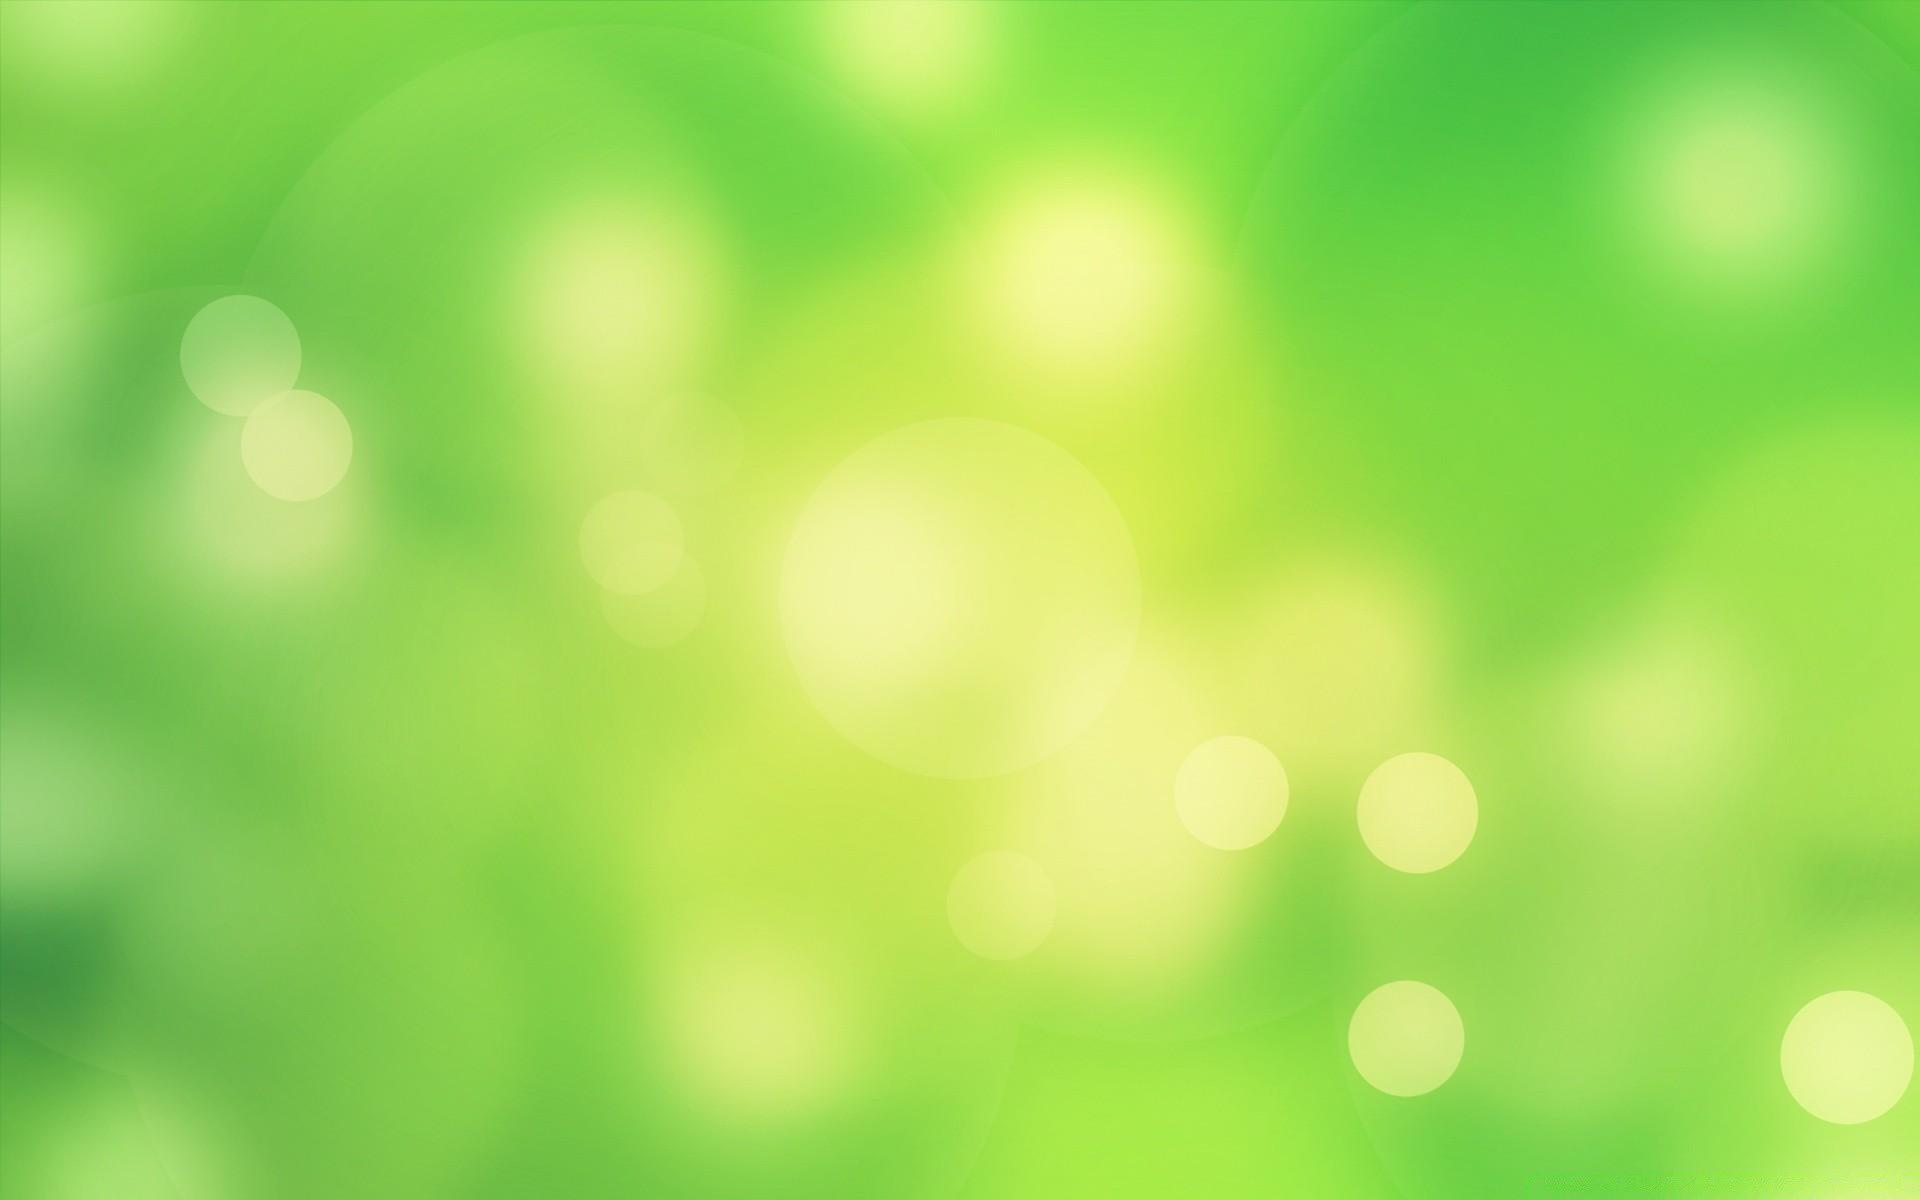 Картинки зеленый фон для презентации